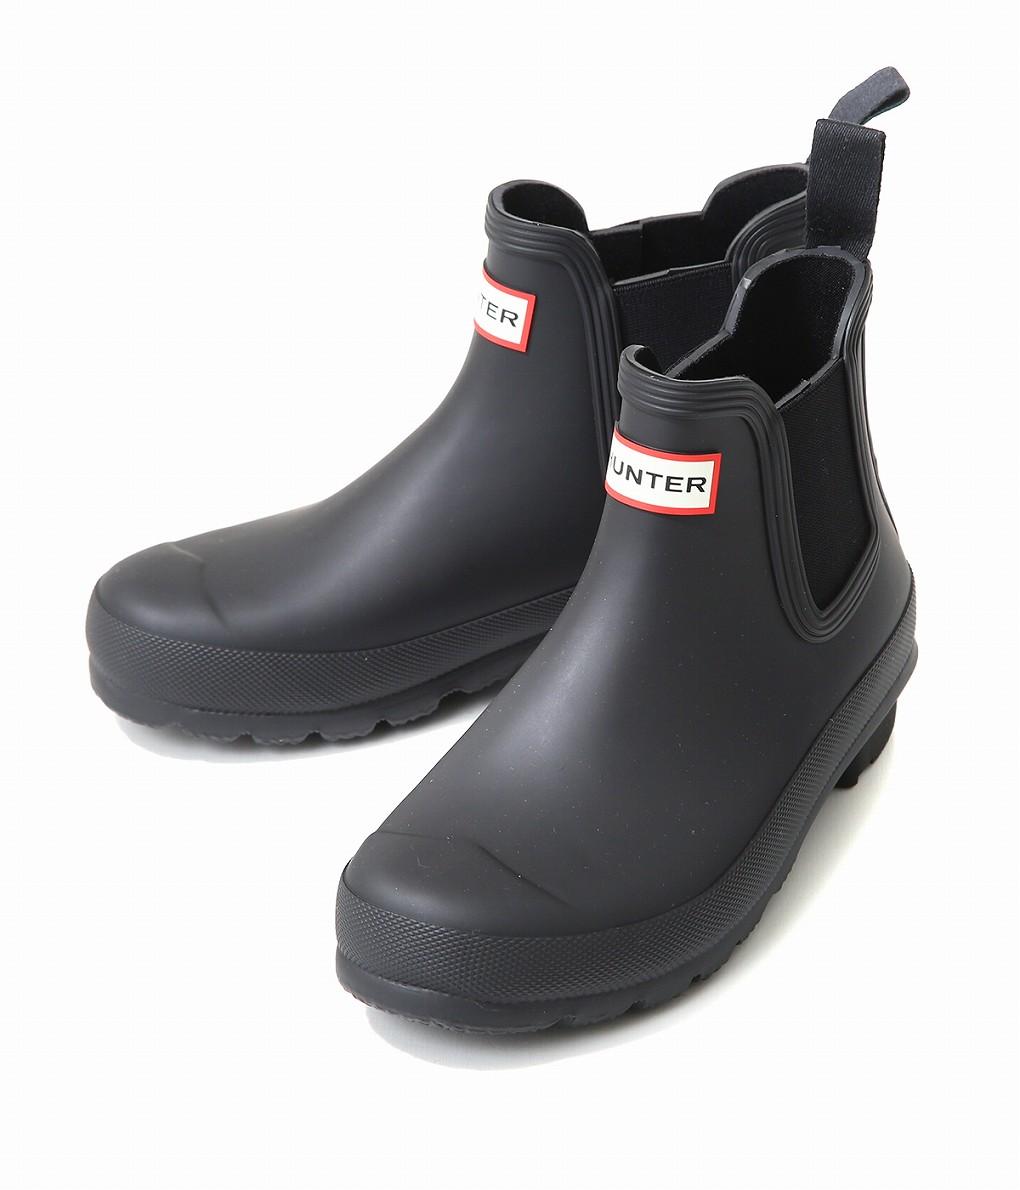 HUNTER / ハンター : 【レディース】WOMENS ORIGINAL CHELSEA ONE TAB US -BLACK- : HUNTER レインブーツ ハンター チェルシー 長靴 雨 : WFS2006RMA 【DEA】